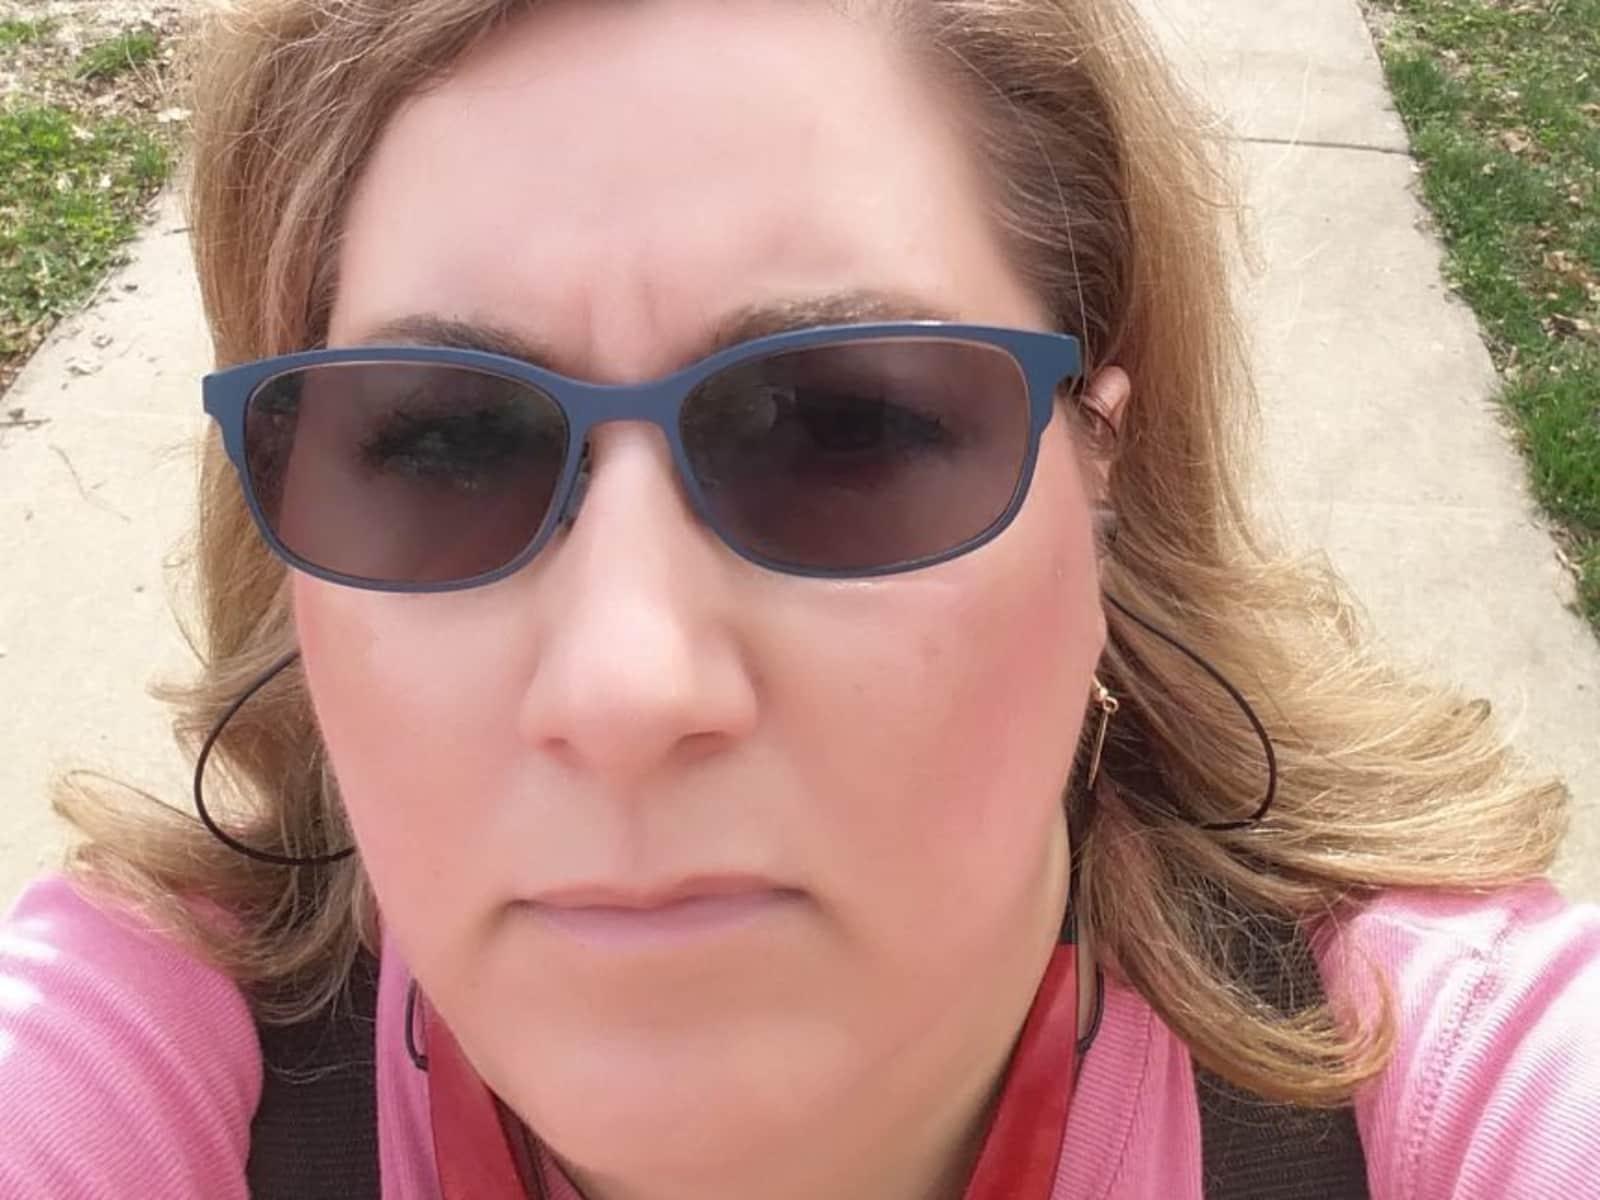 Joan from Kansas City, Missouri, United States